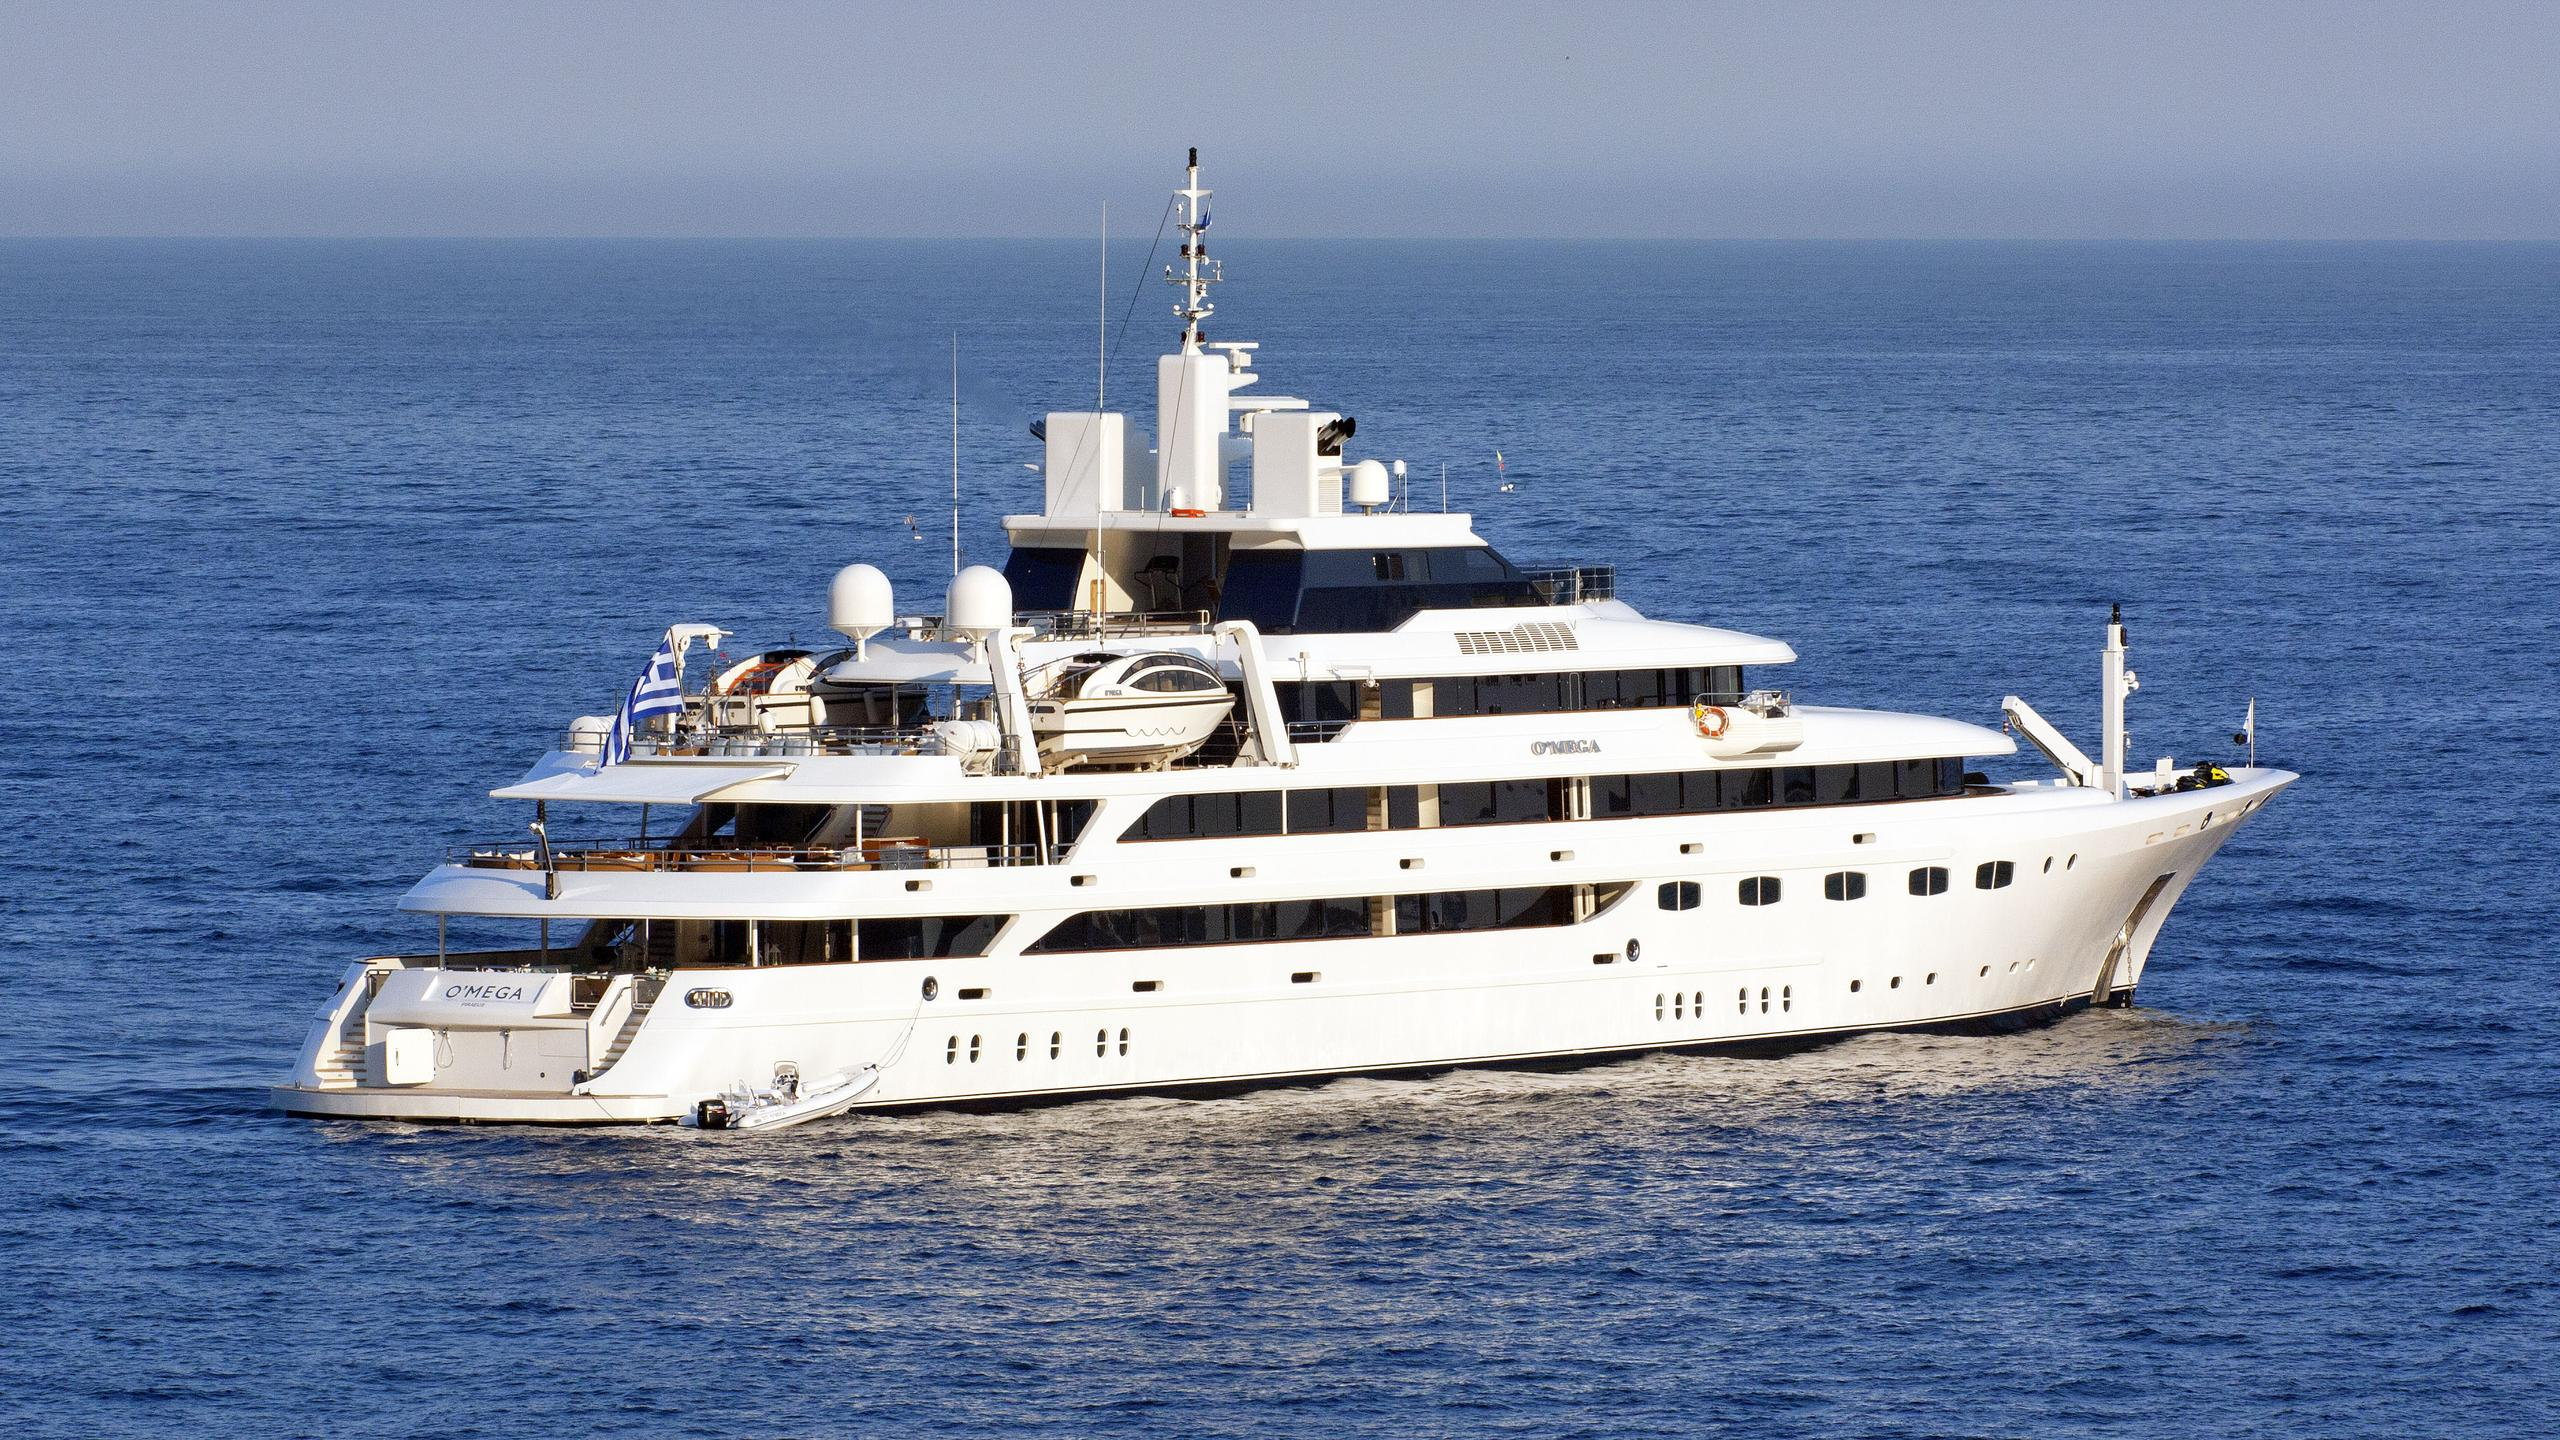 o-mega-motor-yacht-mitsubishi-hi-1985-82m-half-profile